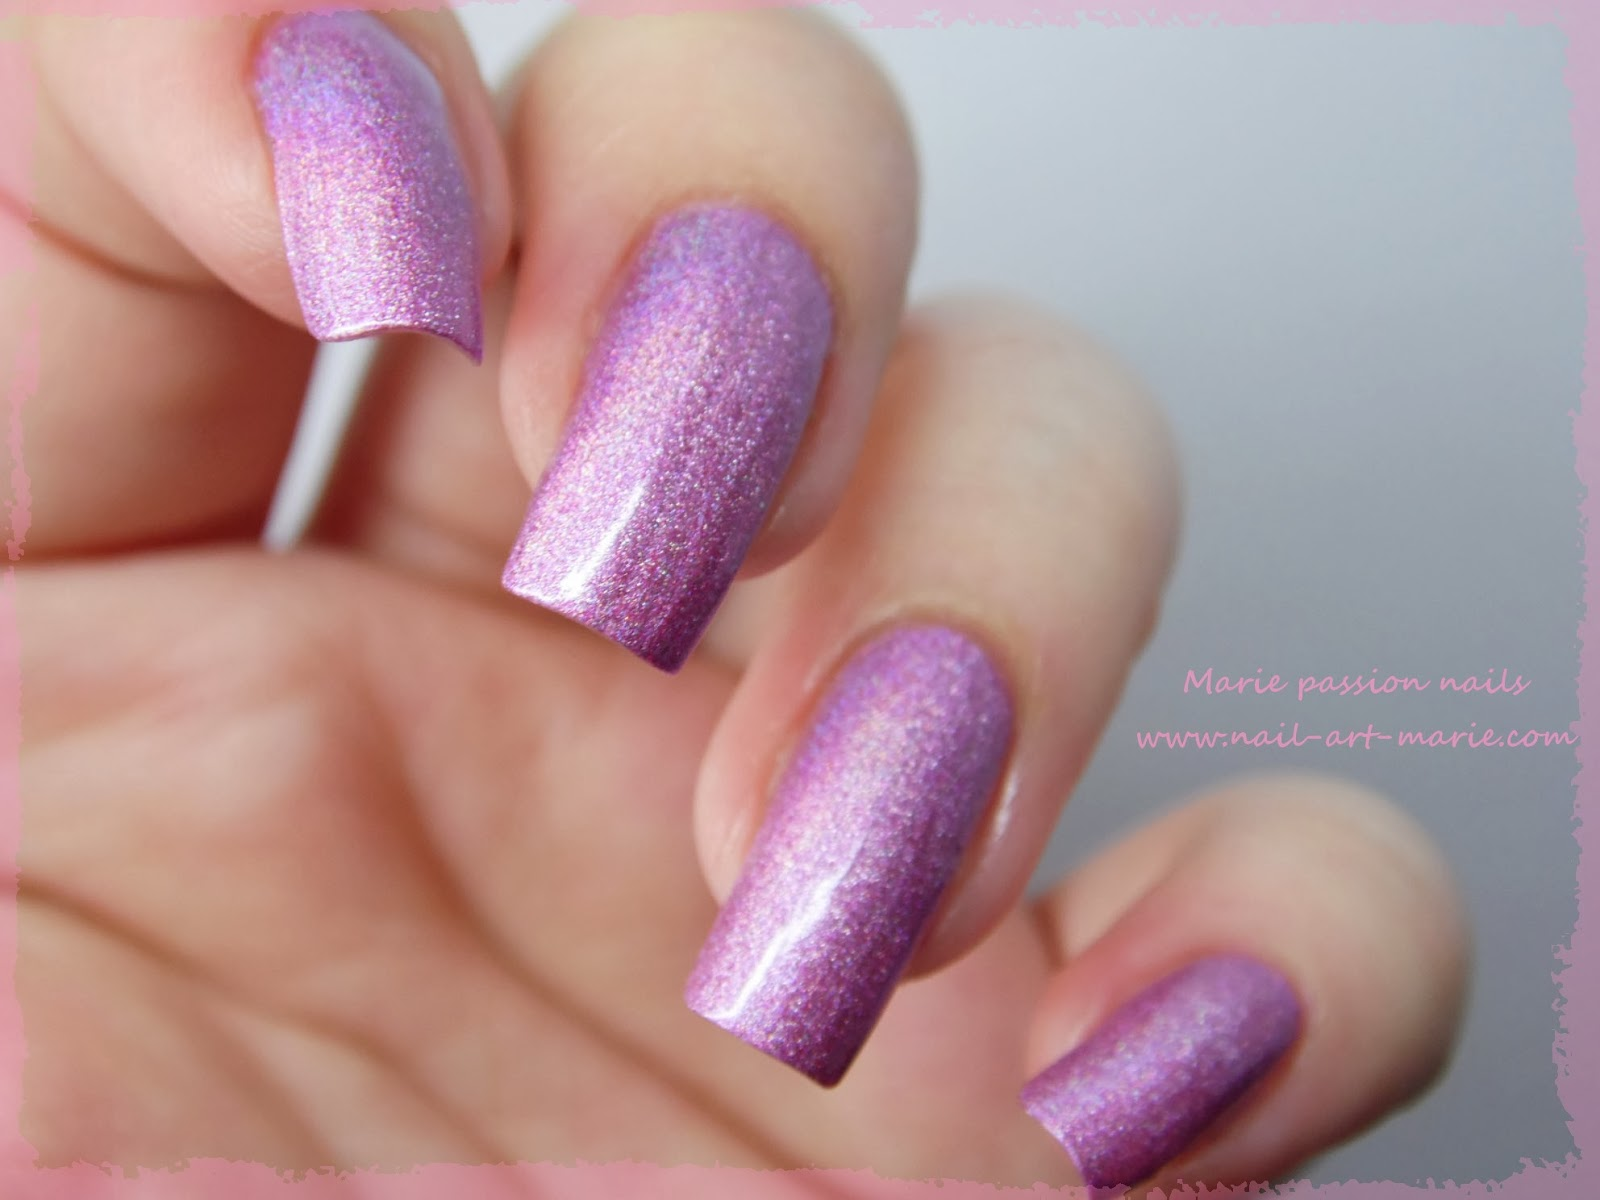 LM Cosmetic Izar7